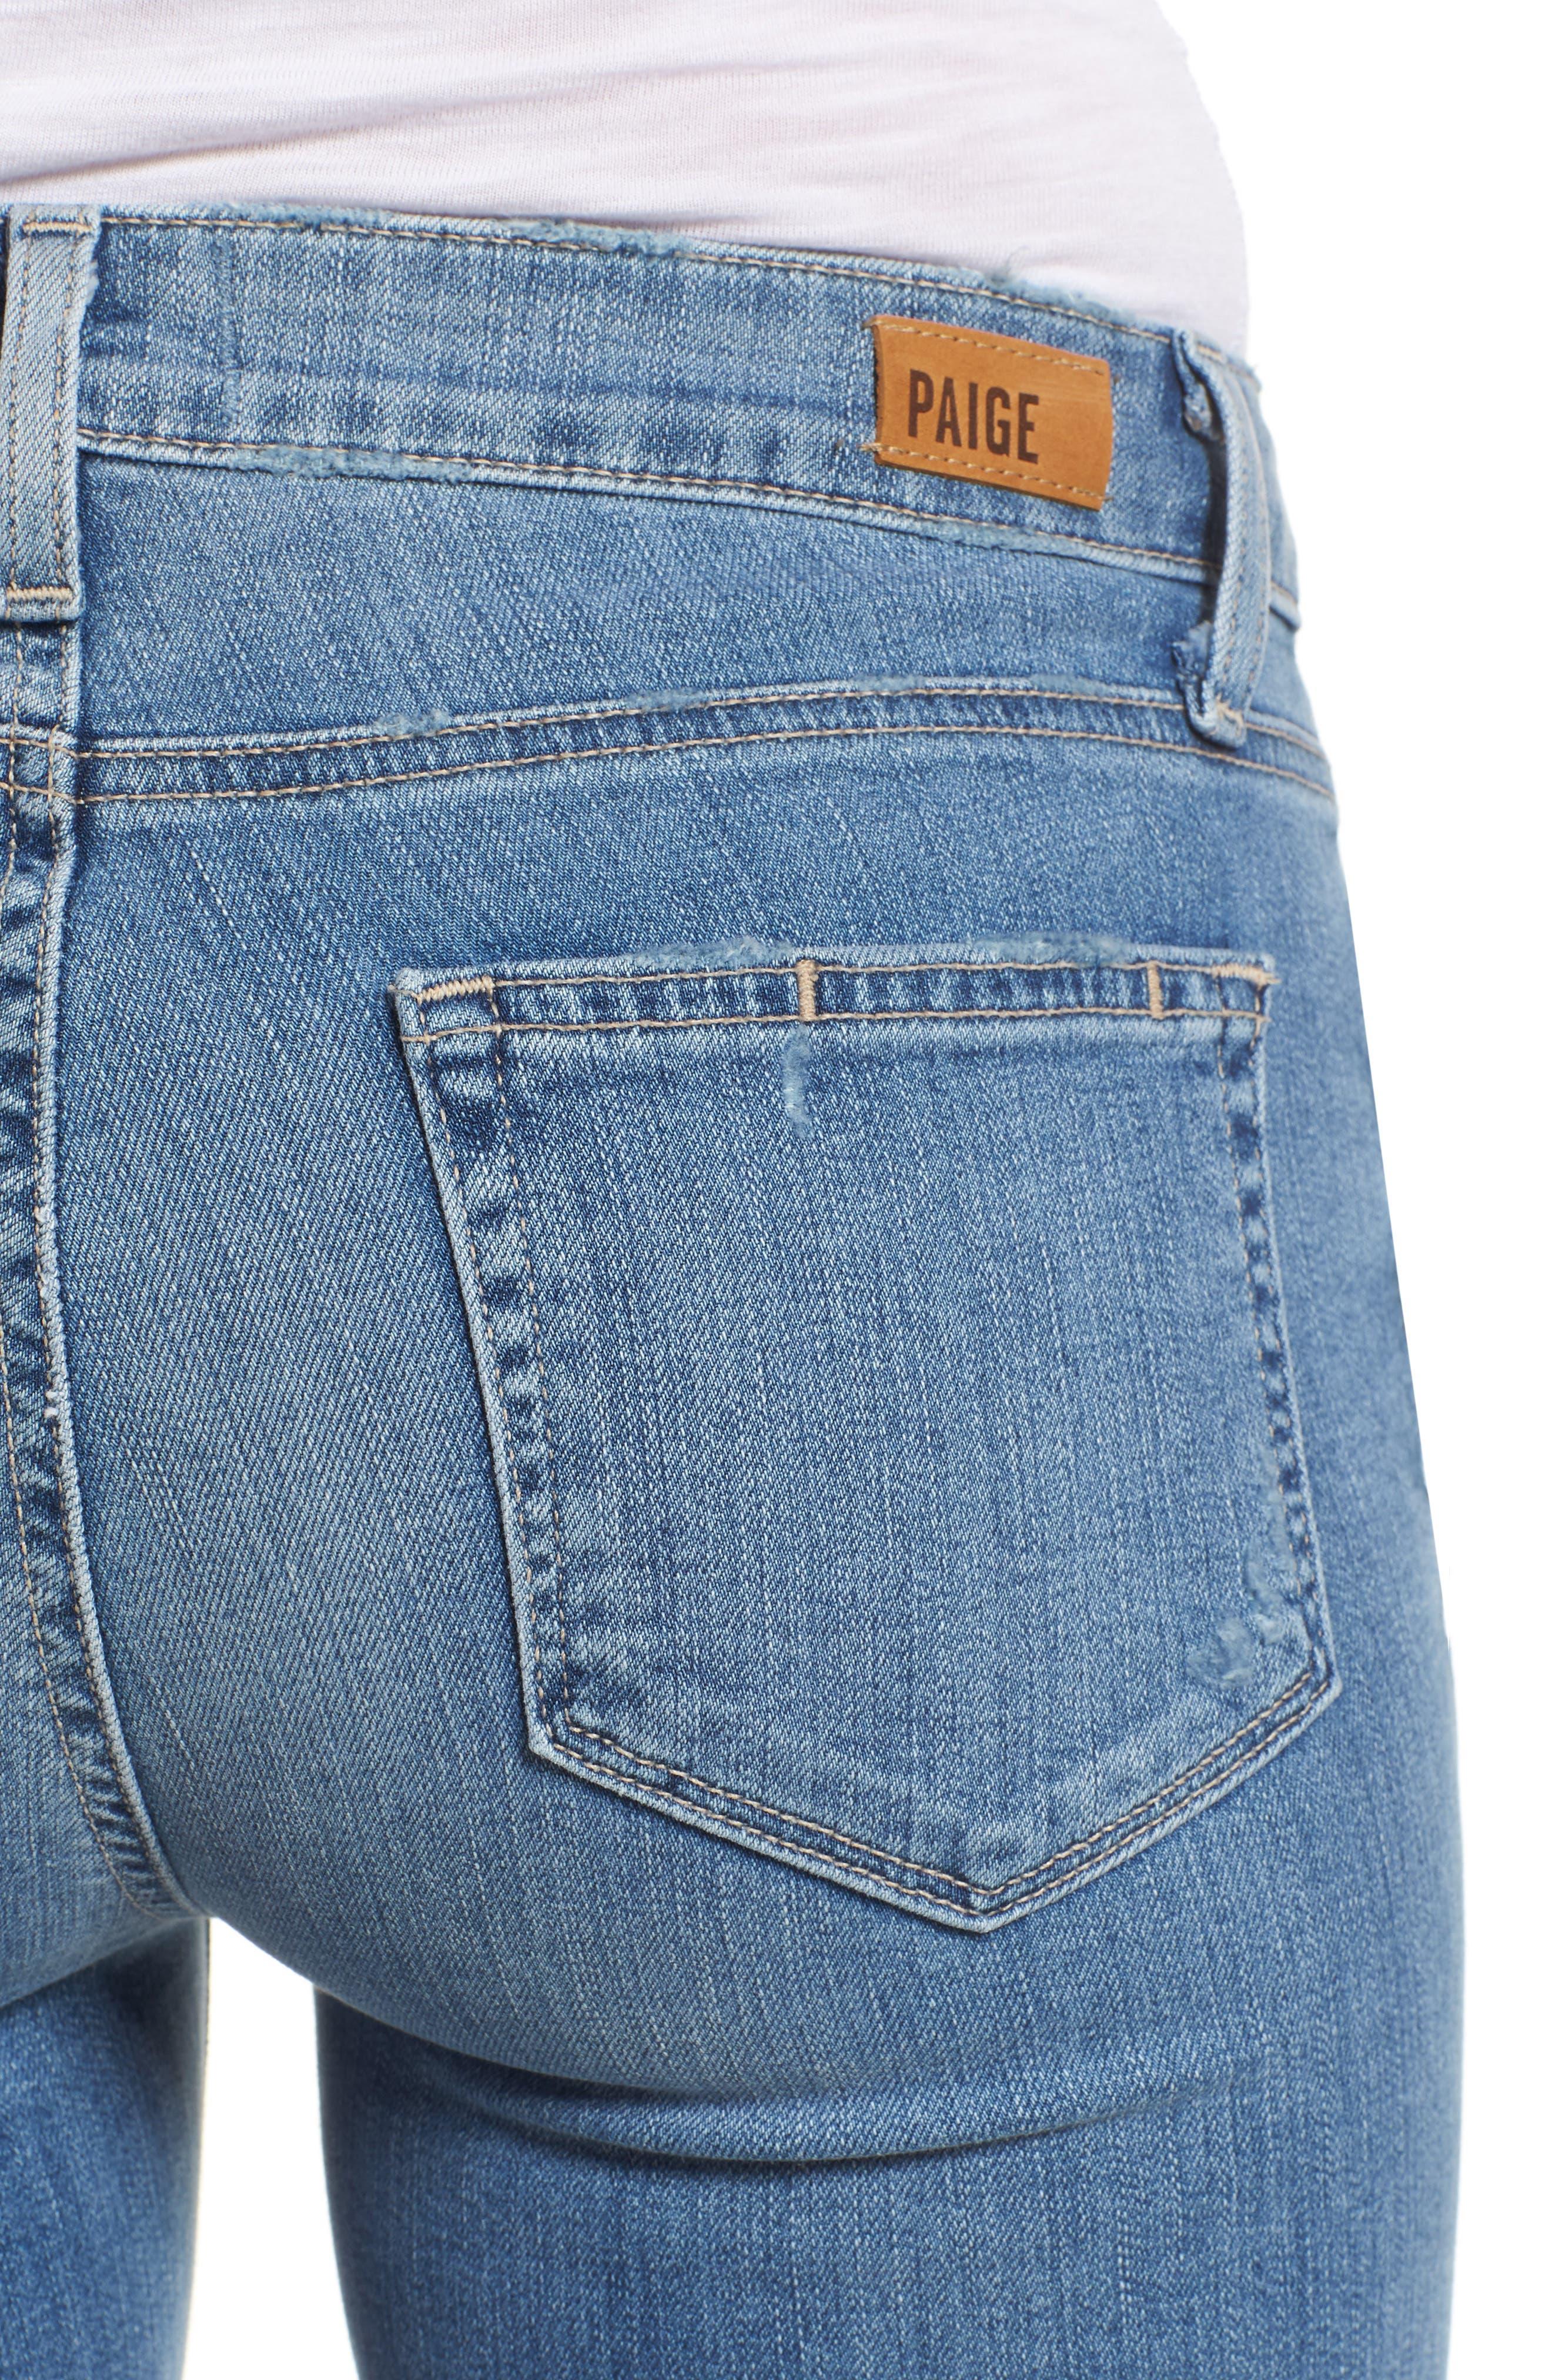 Verdugo Crop Skinny Jeans,                             Alternate thumbnail 4, color,                             SOTO